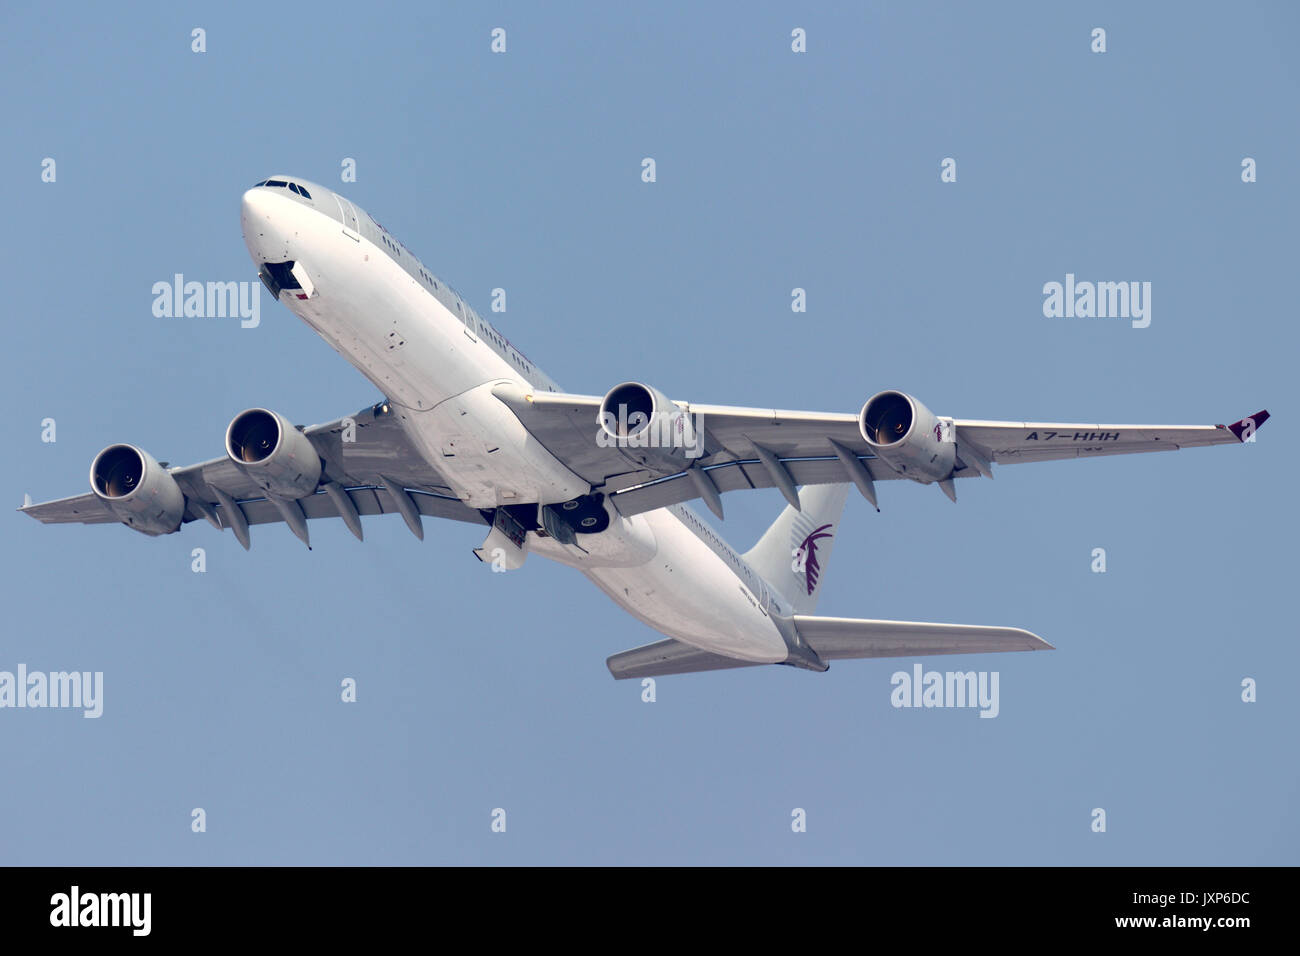 Sheremetyevo, Moscow Region, Russia - April 14, 2014: Qatar Amiri Flight A7-HHH Airbus A340-500 taking off at Sheremetyevo international airport. - Stock Image